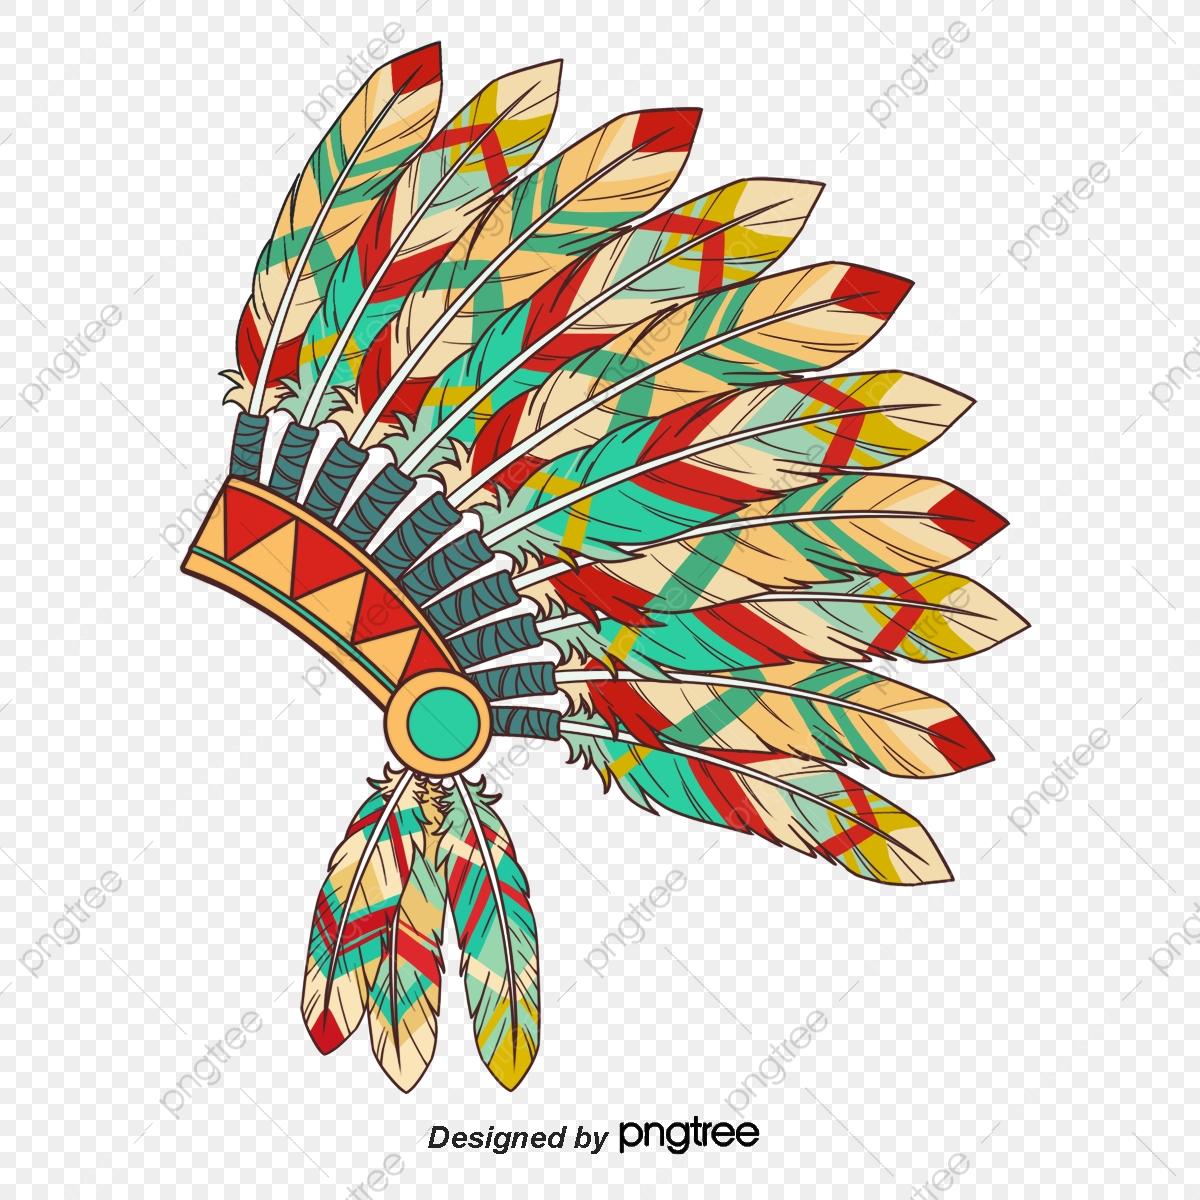 Indian Feather Headdress, Boho, Indian, Indian Headdress PNG.